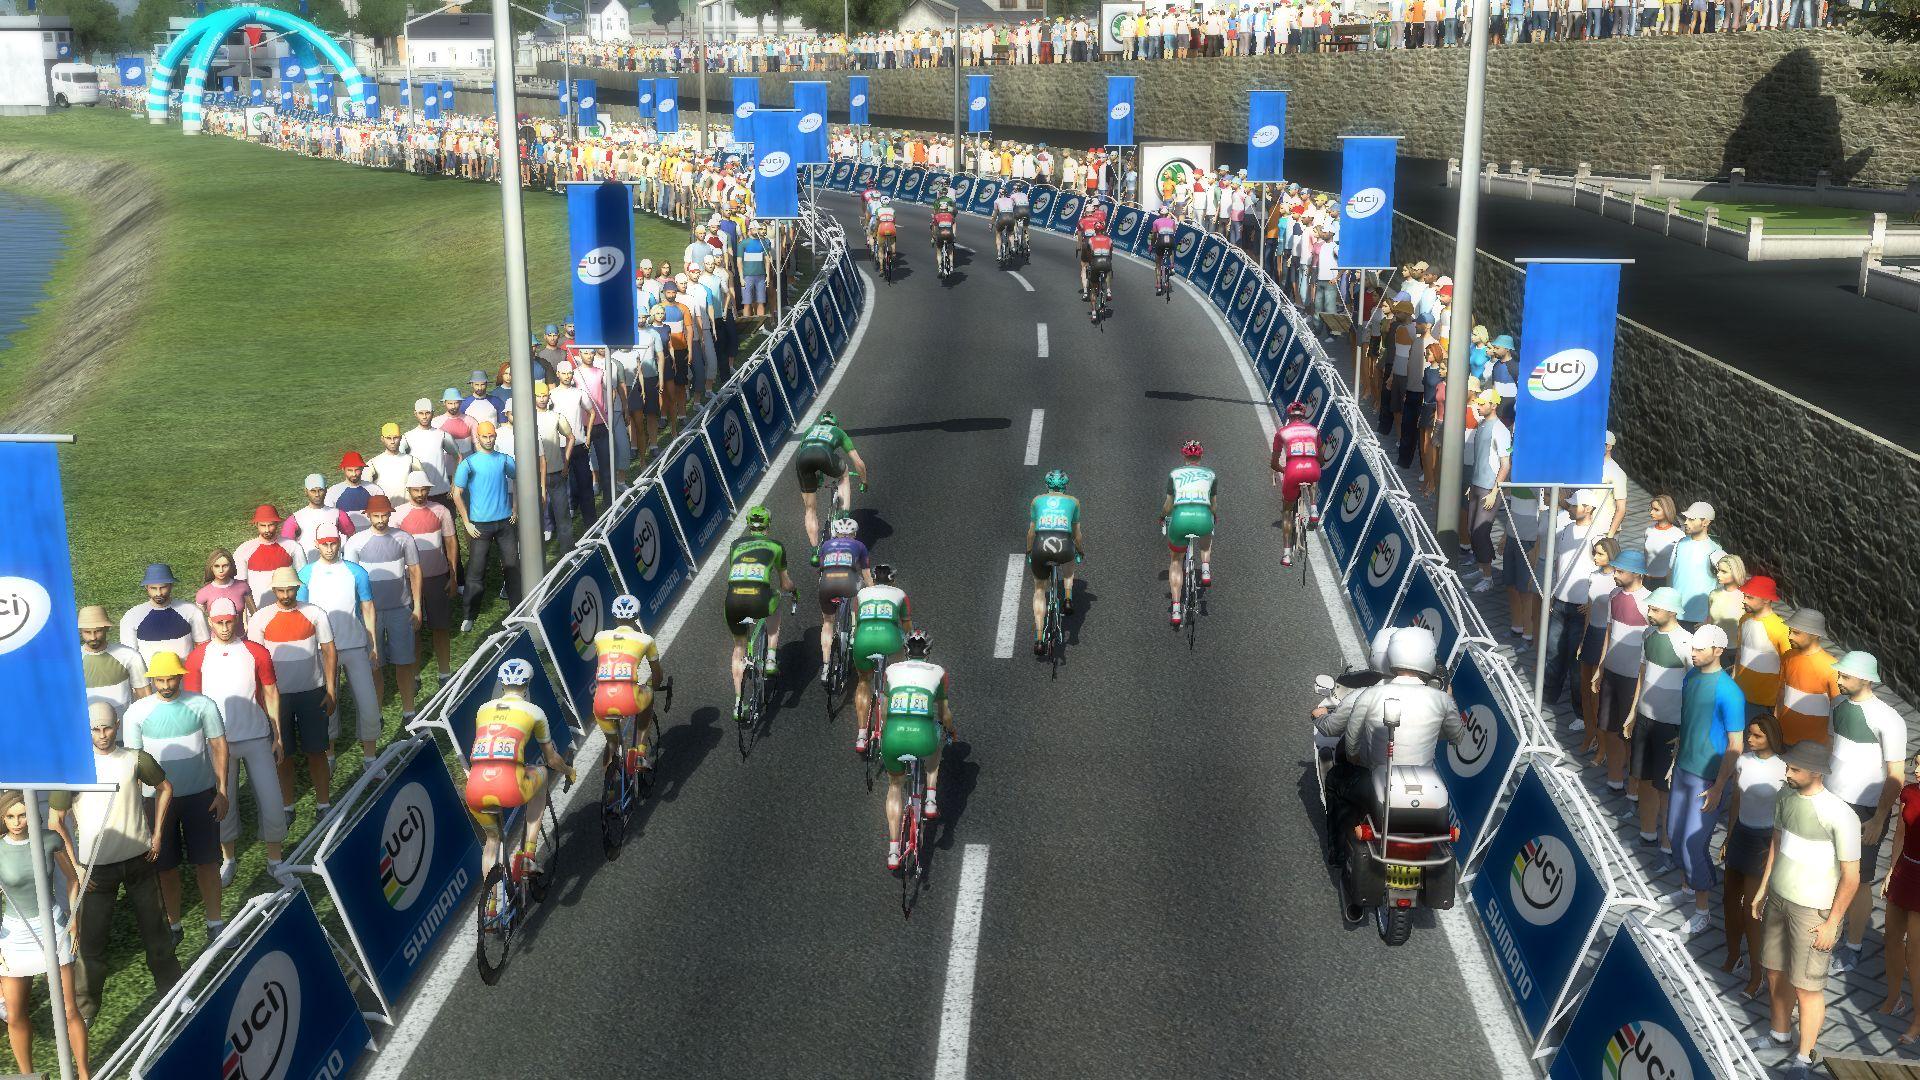 pcmdaily.com/images/mg/2018/Races/C2HC/Zuri/Zuri%2028.jpg